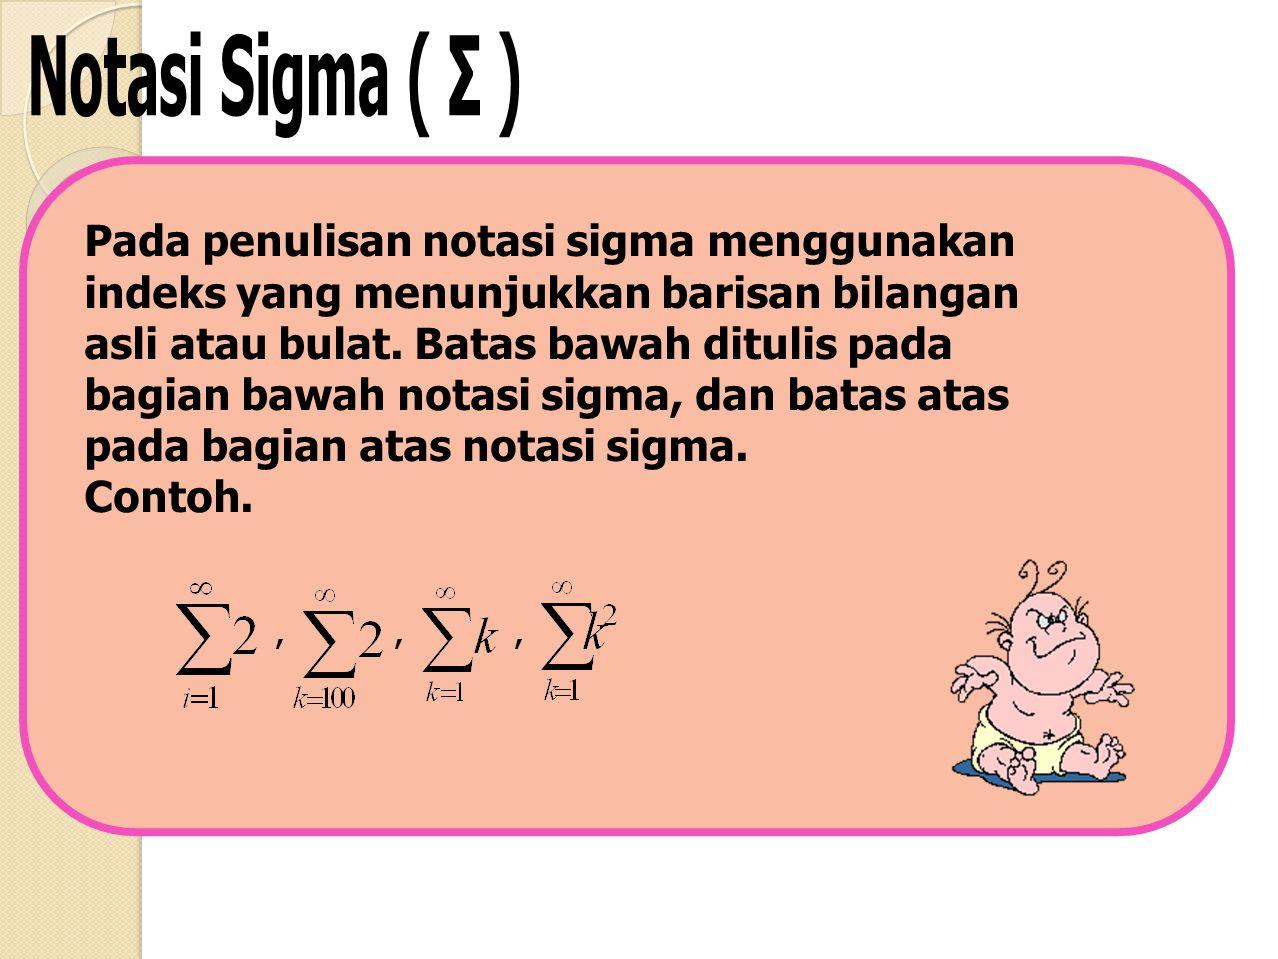 Pada penulisan notasi sigma menggunakan indeks yang menunjukkan barisan bilangan asli atau bulat.